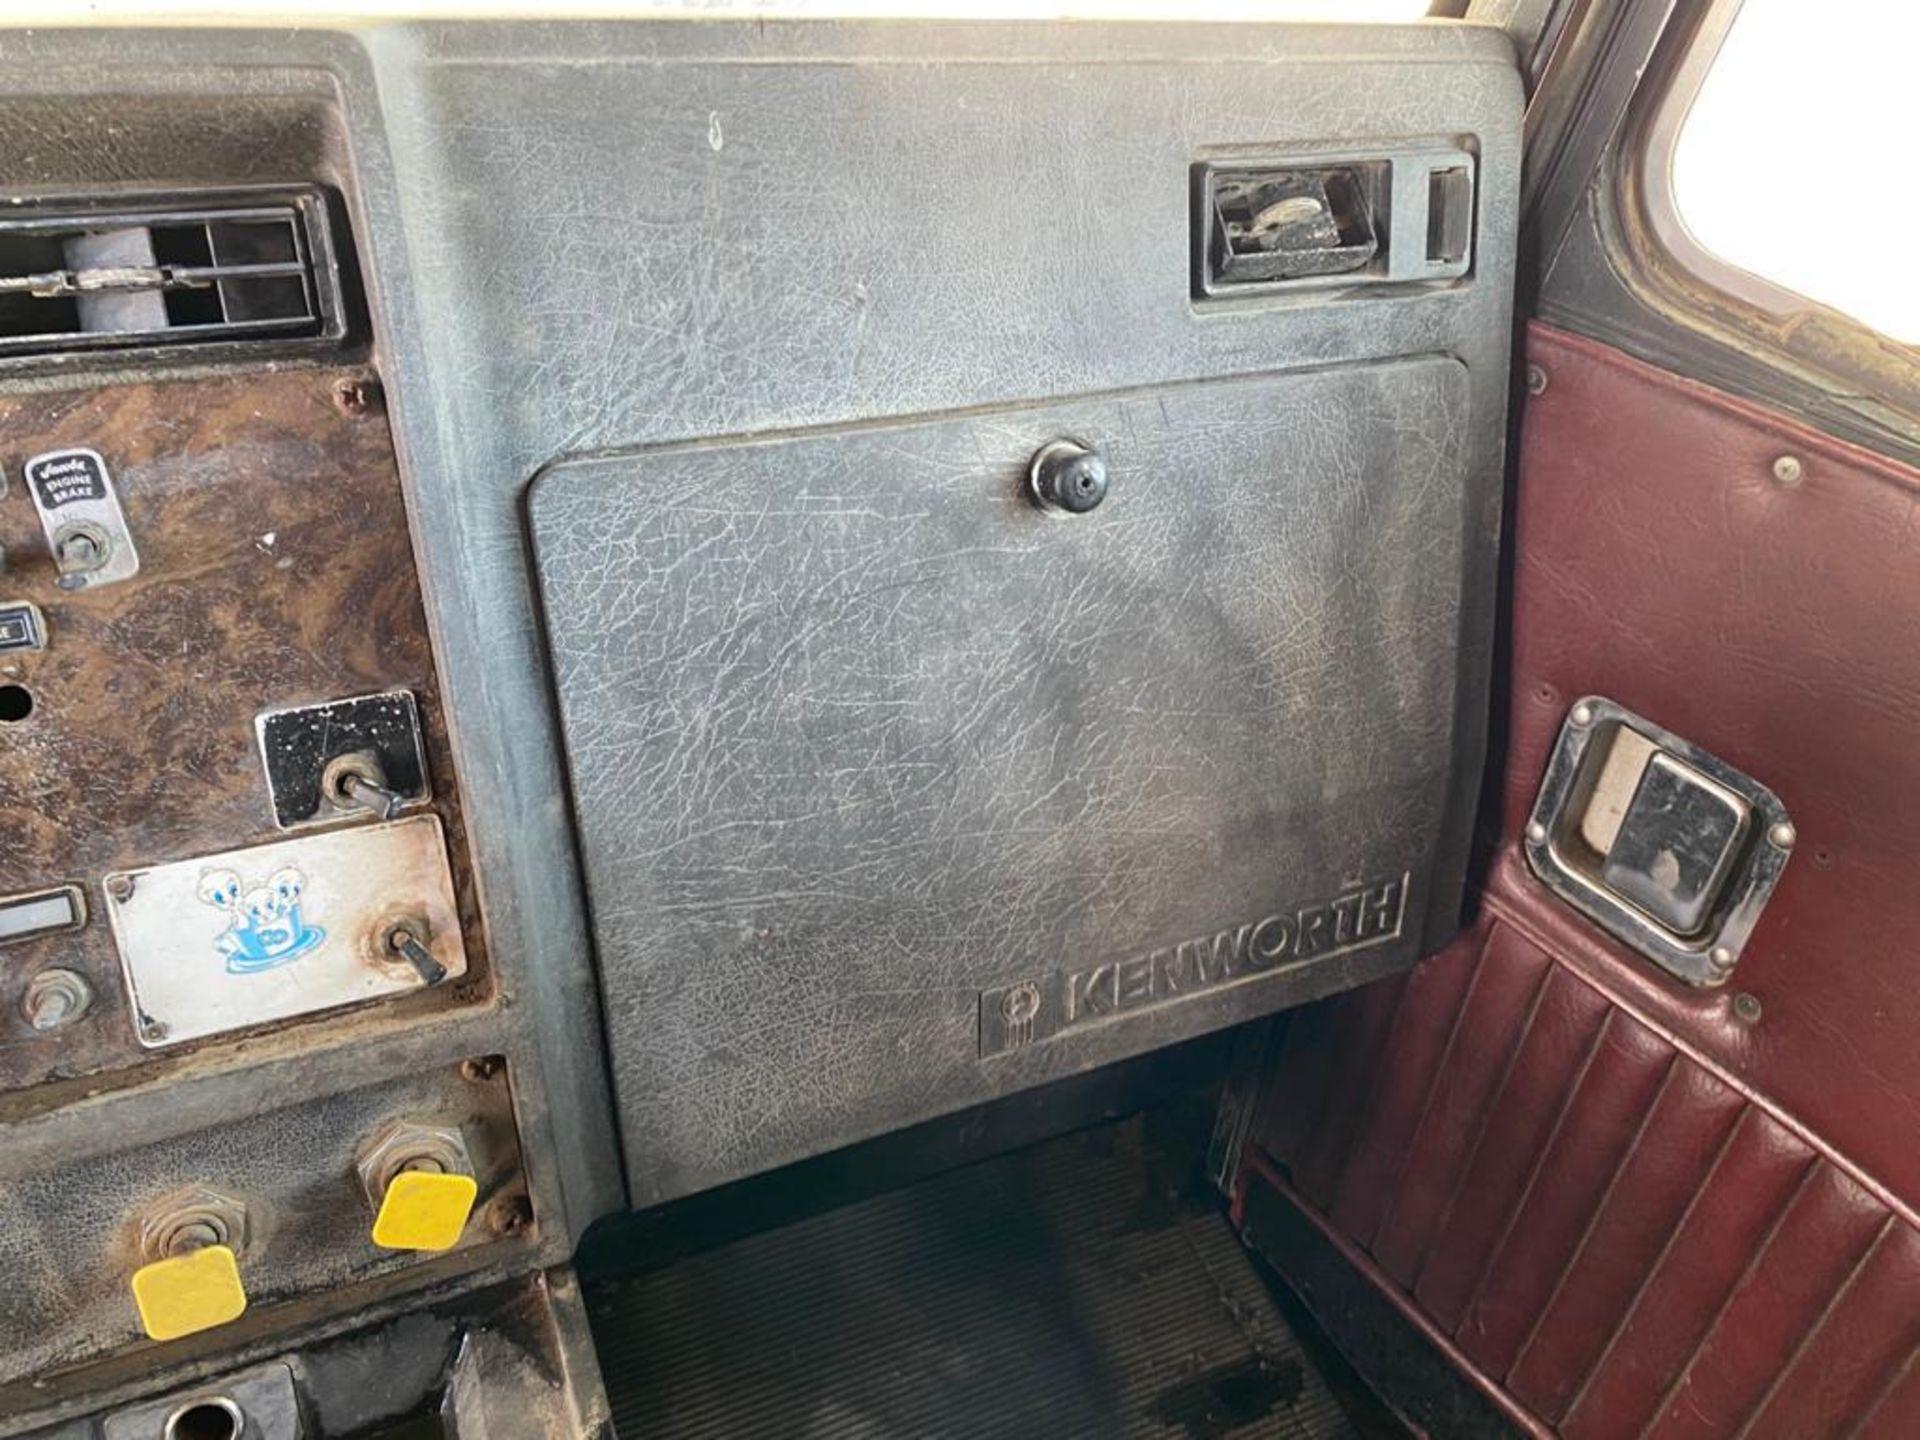 1983 Kenworth Dump Truck, standard transmission of 10 speeds, with Cummins motor - Image 24 of 68